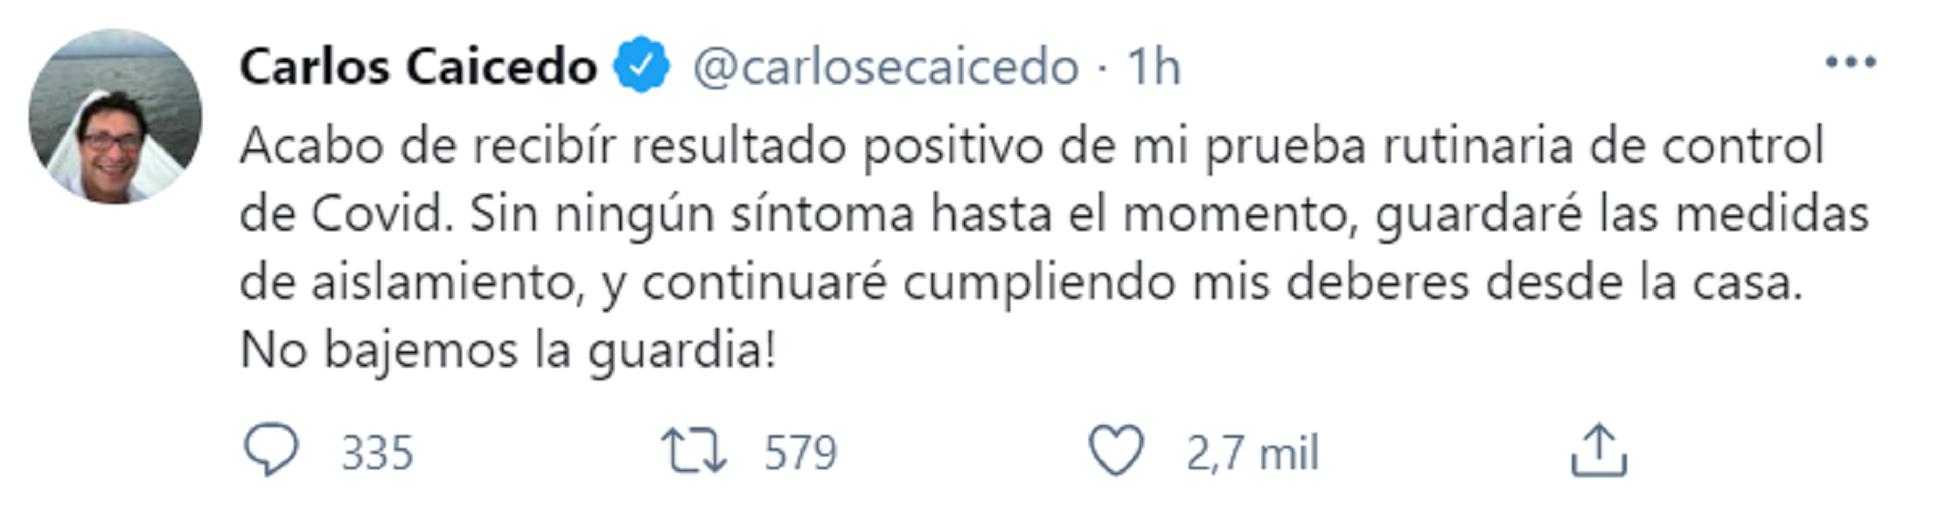 Gobernador de Magdalena Carlos Caicedo  dio positivo para covid-19. Foto: Twitter: Carlos Caicedo.